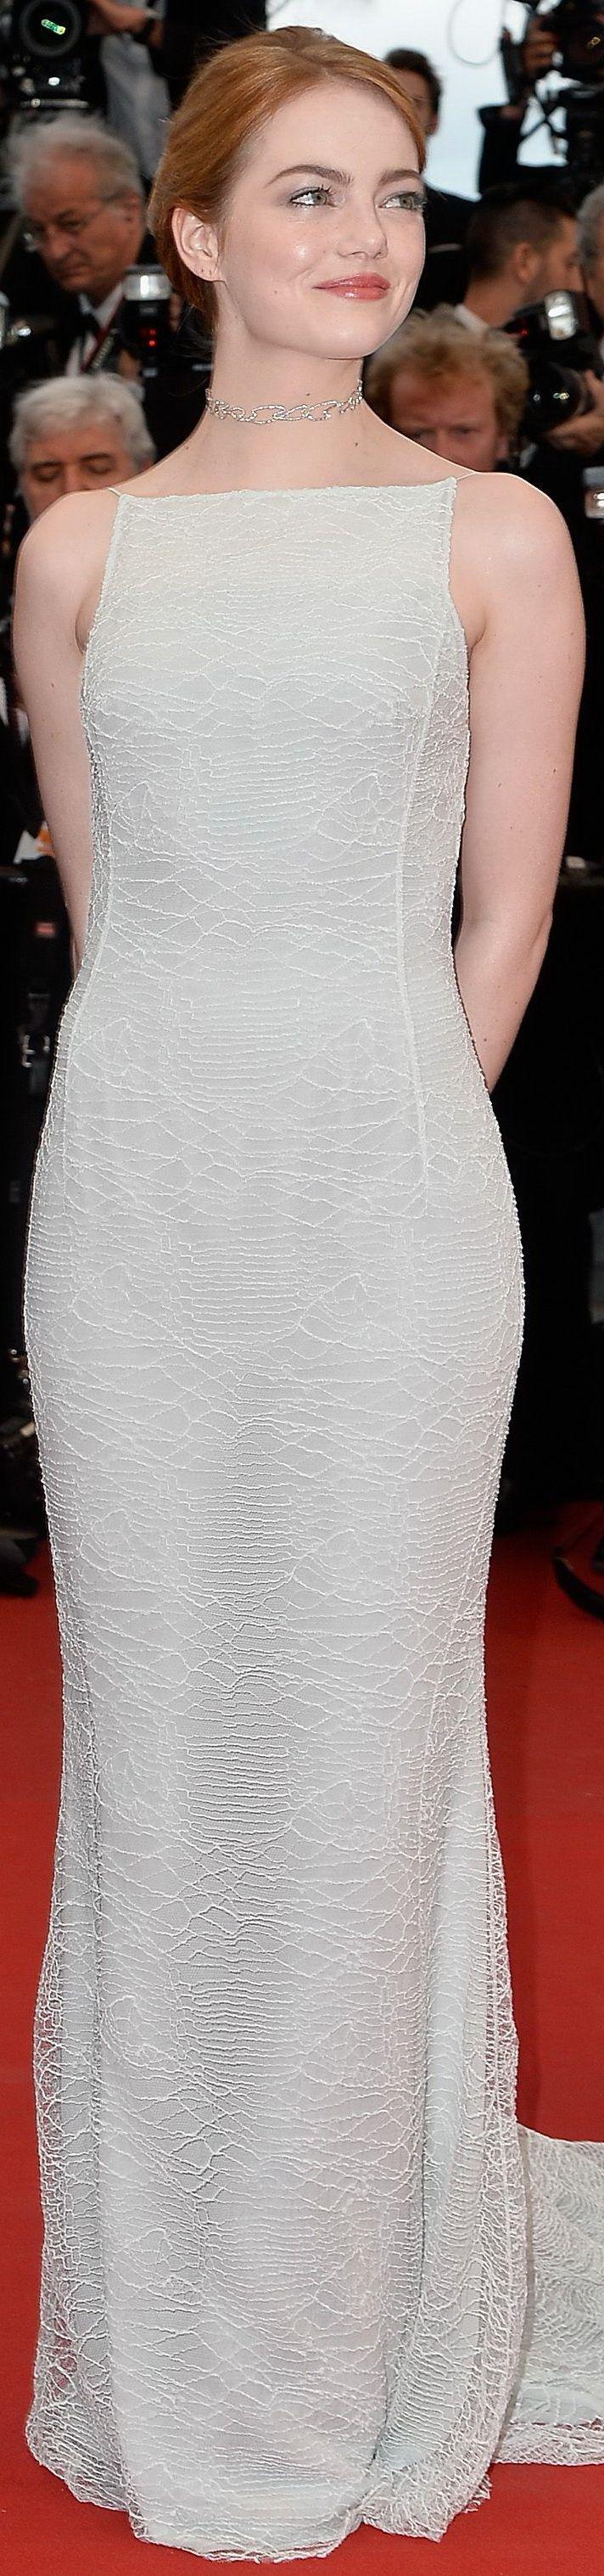 Emma Stone at red carpet.